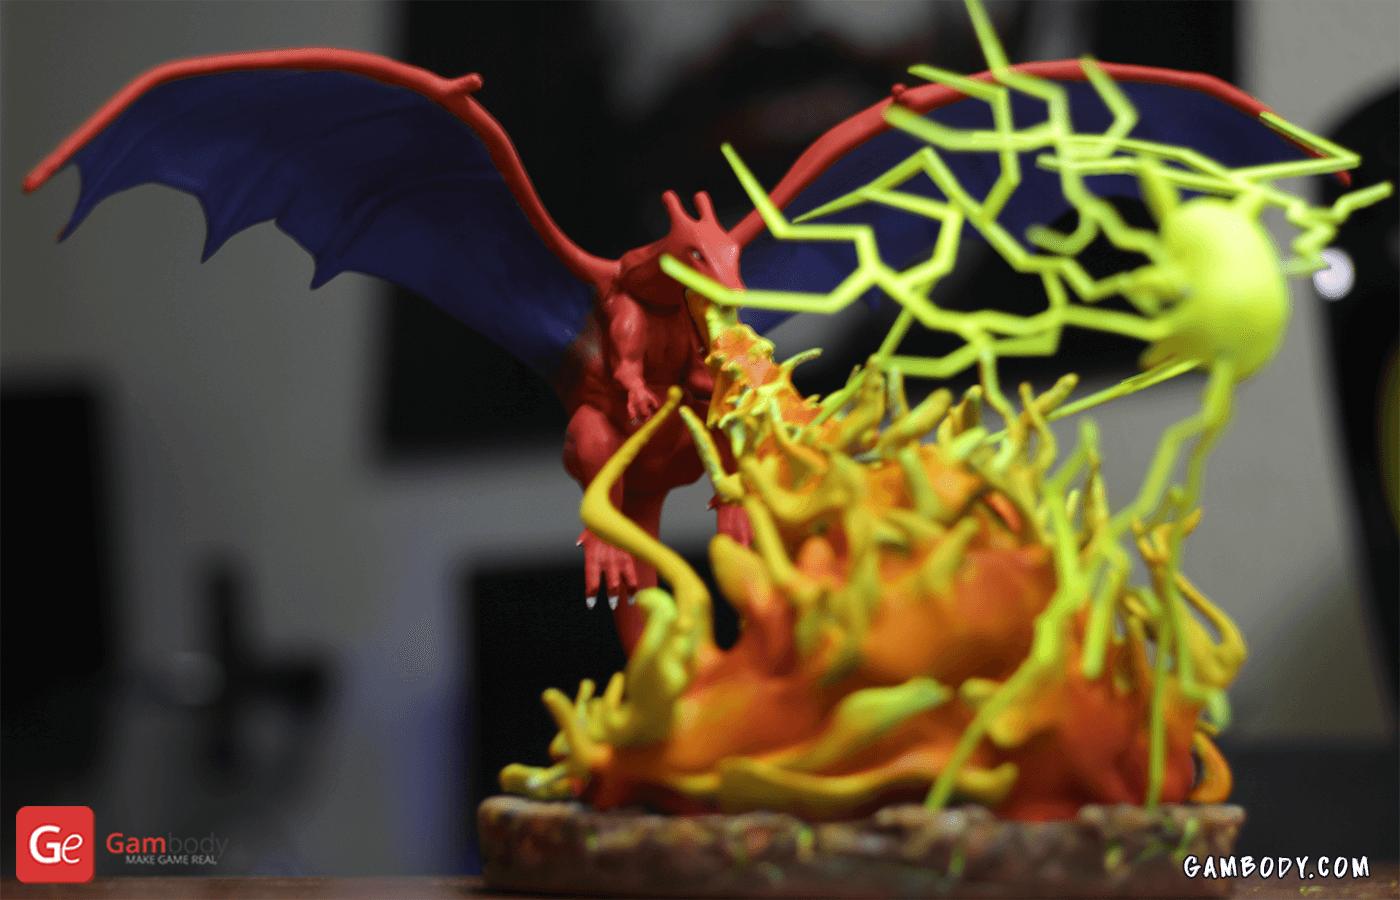 Pikachu & Charizard 3D Printing Diorama